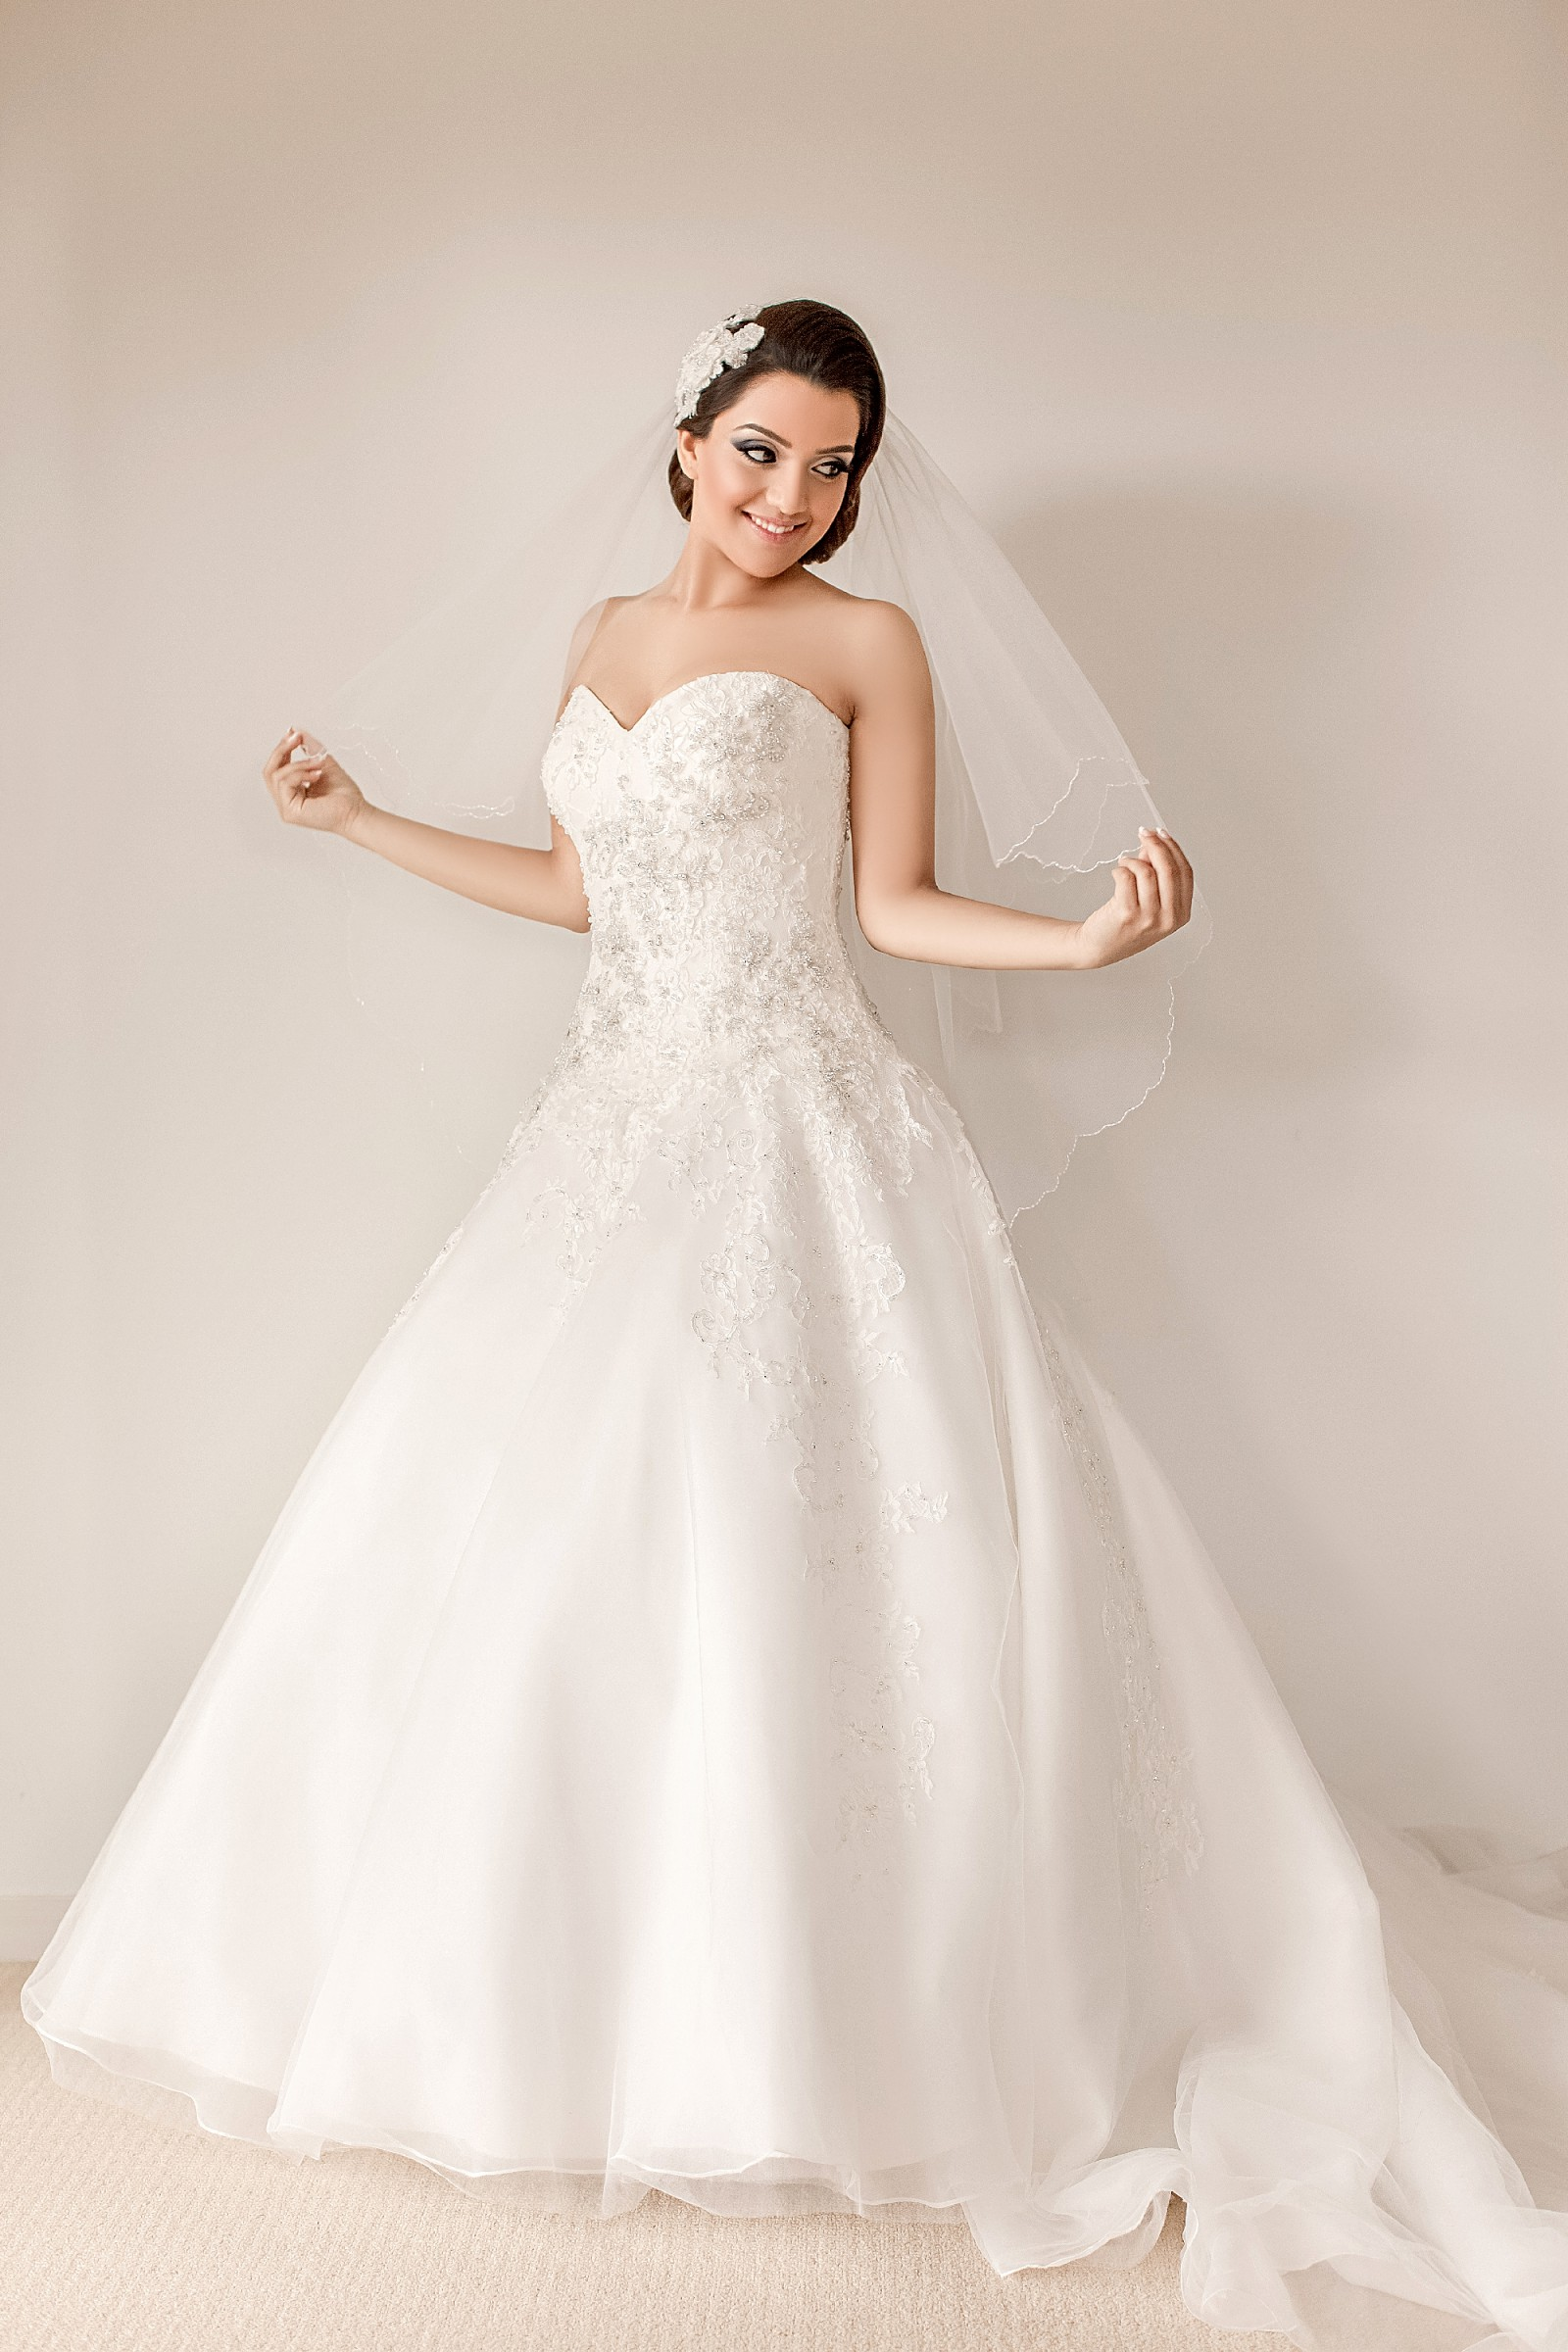 Roz la kelin harlow diamond collection 5659t second hand for Second hand wedding dresses london